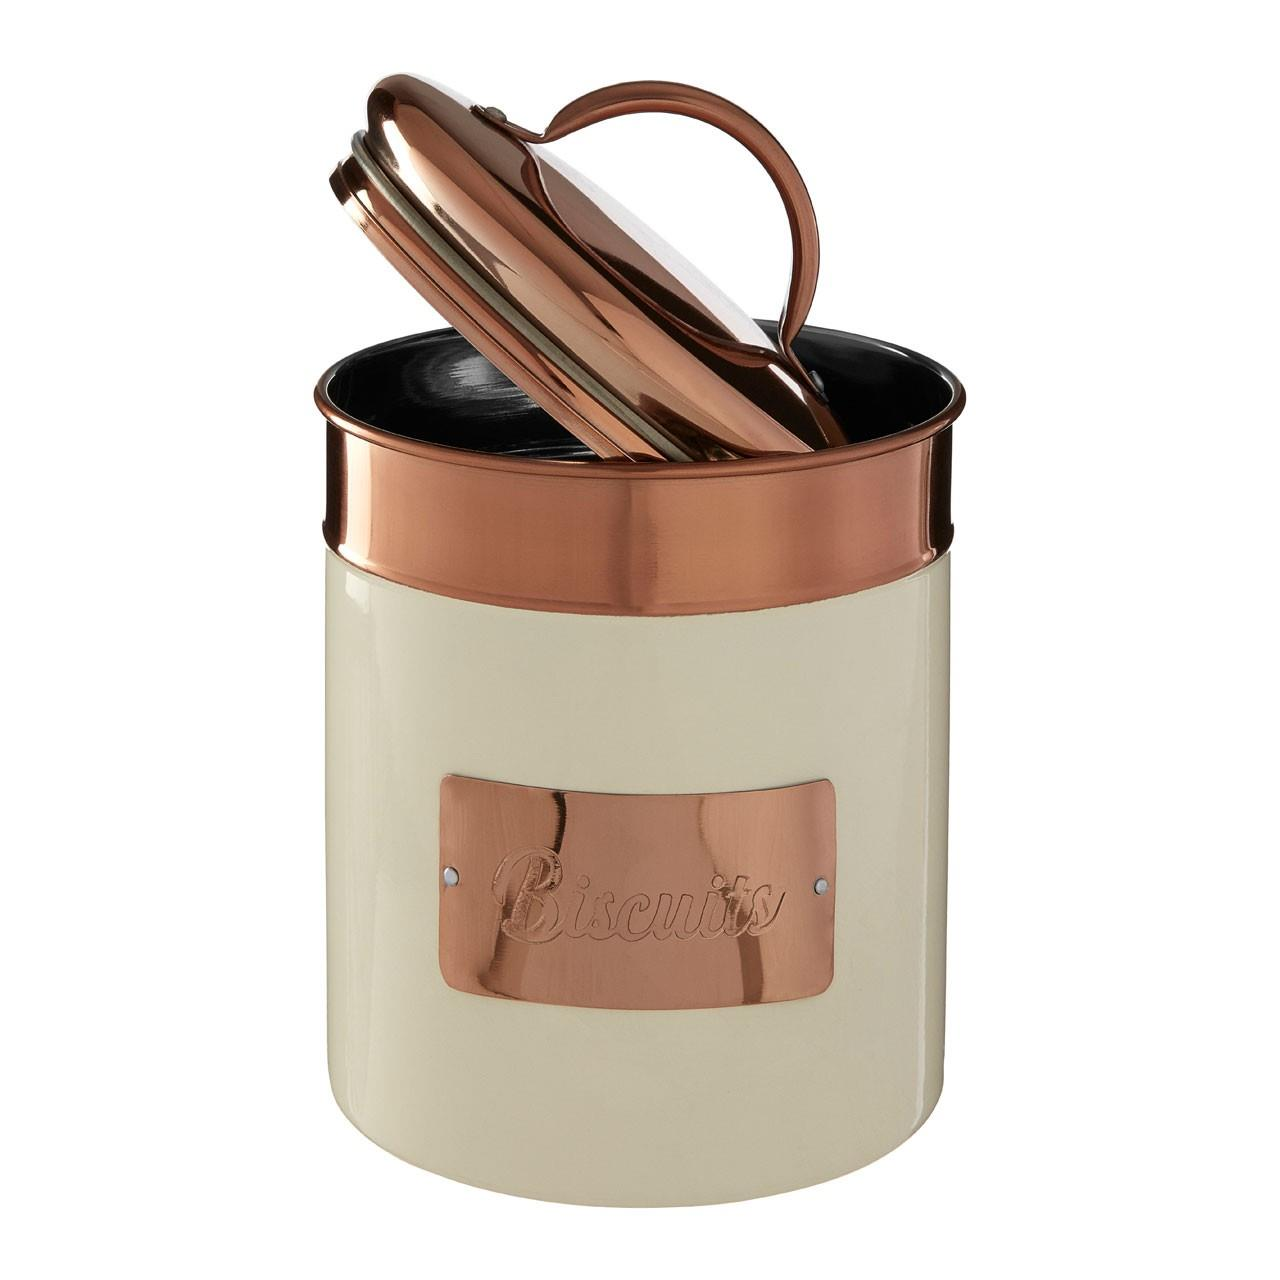 Prescott-Cream-Copper-Bread-Bin-Biscuit-Sugar-Coffee-Canister-Utensil-Holder thumbnail 10